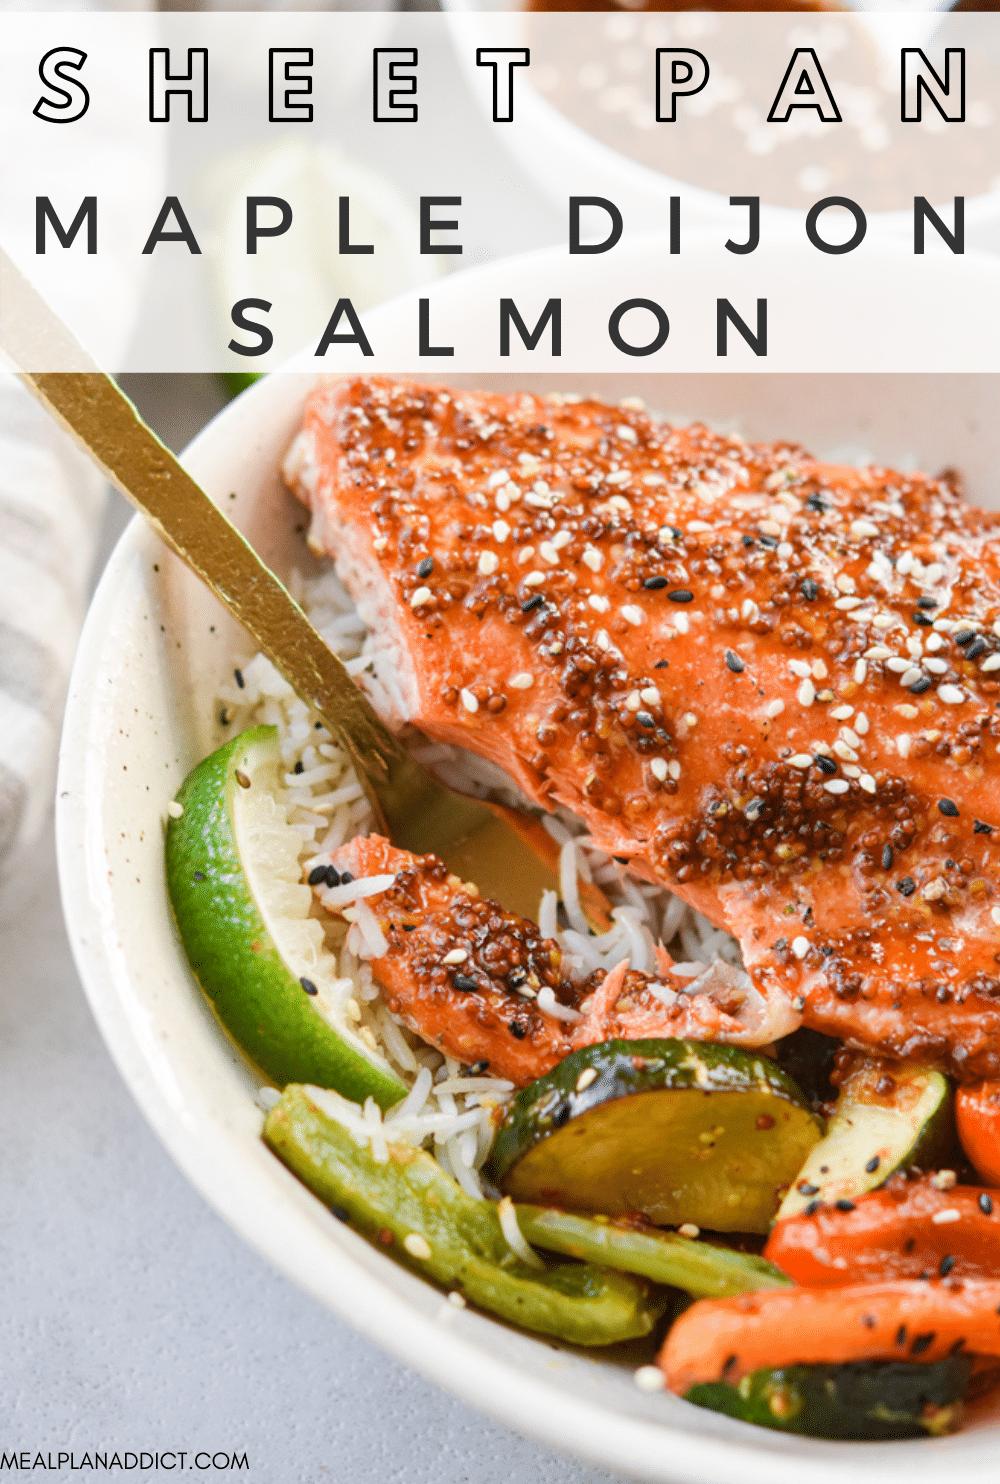 Maple dijon salmon pin for Pinterest